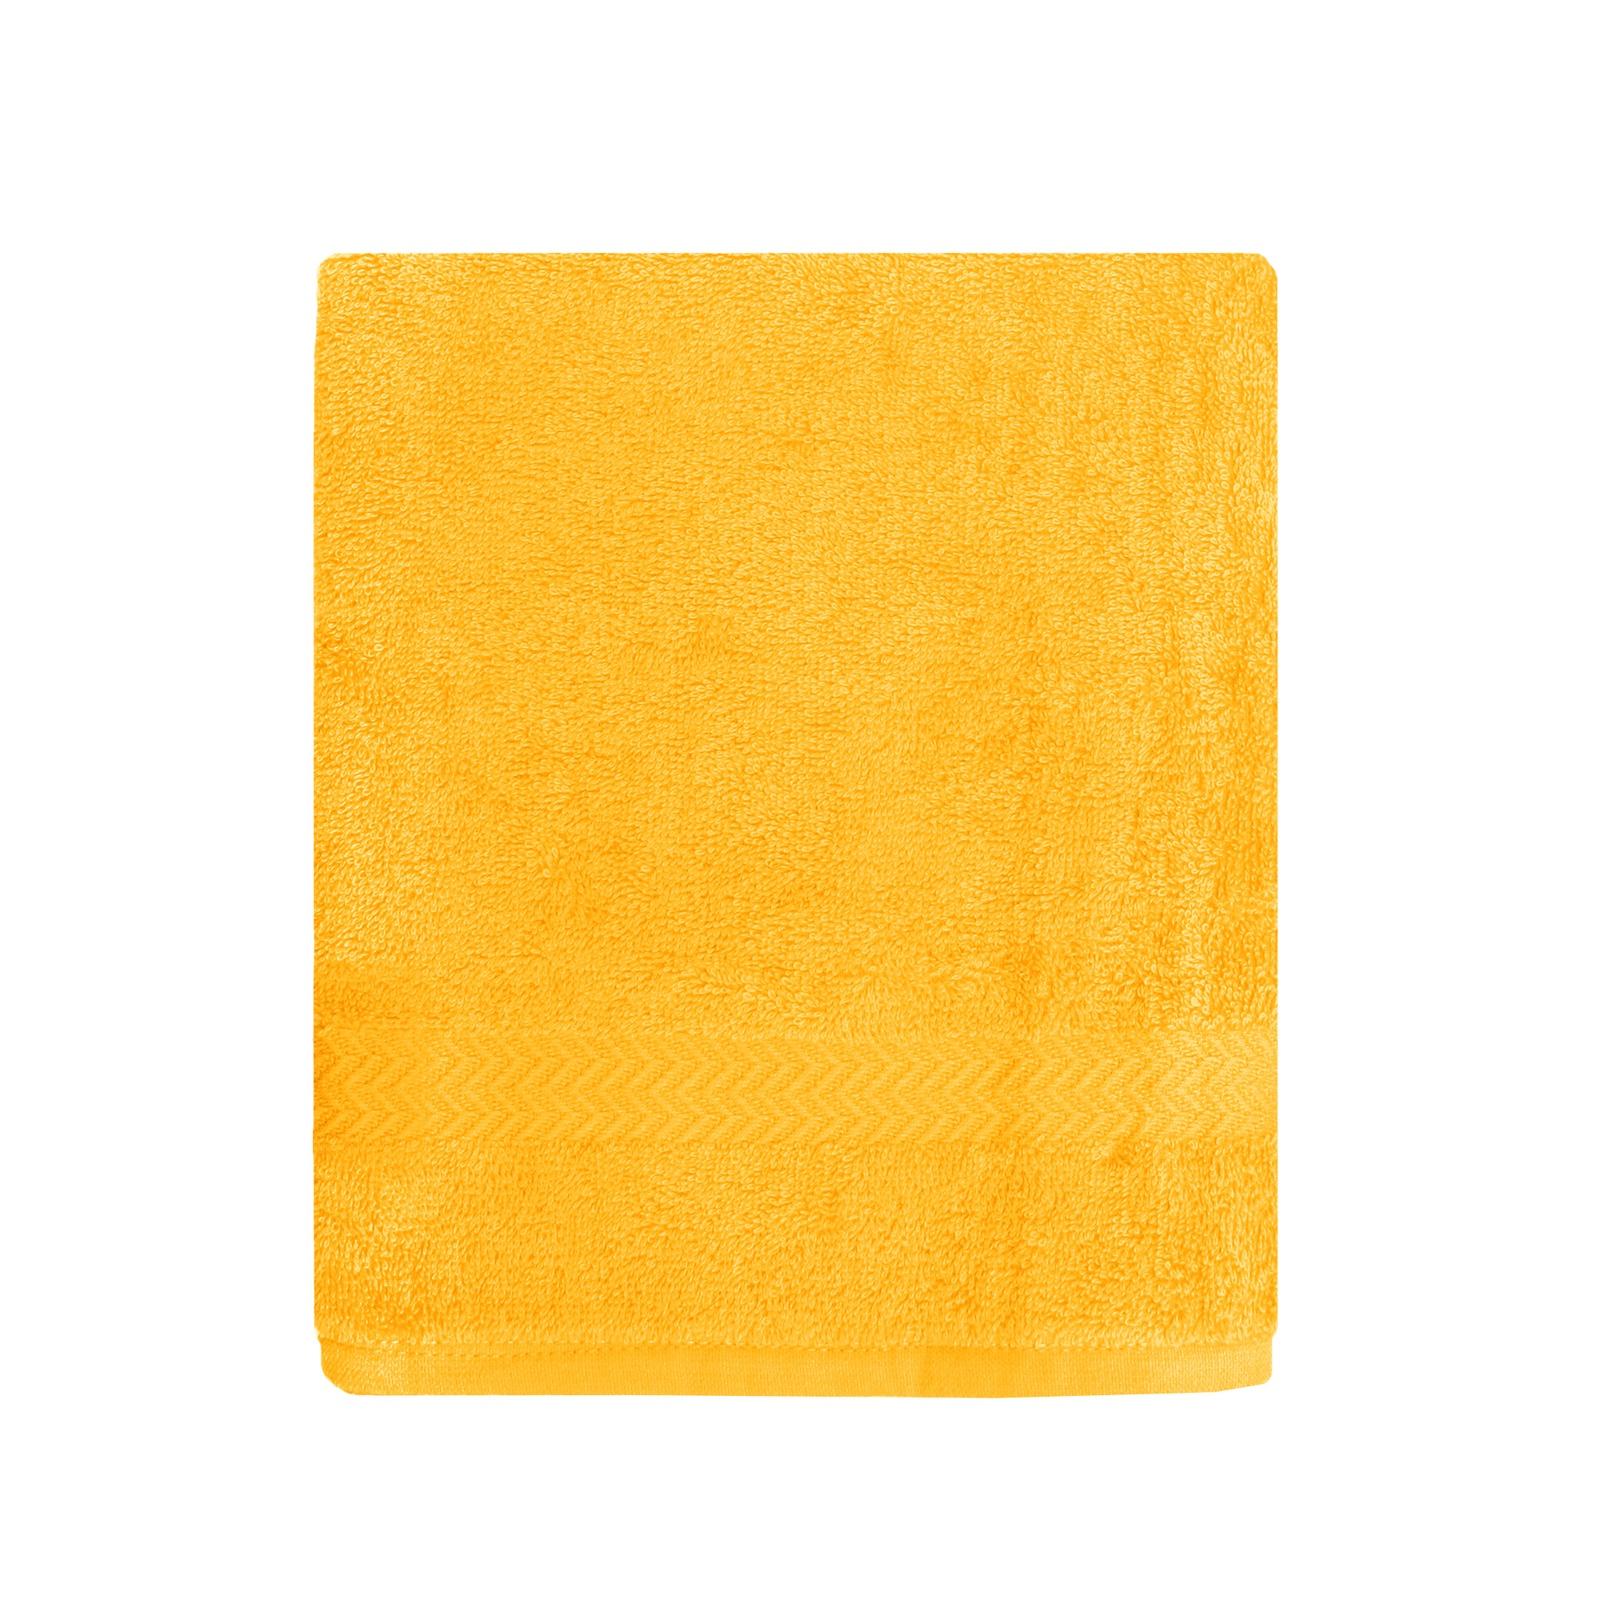 Полотенце банное Bonita Classic, 21011215072, желтый, 50 х 90 см полотенце банное mona liza orchid цвет белый 50 х 90 см